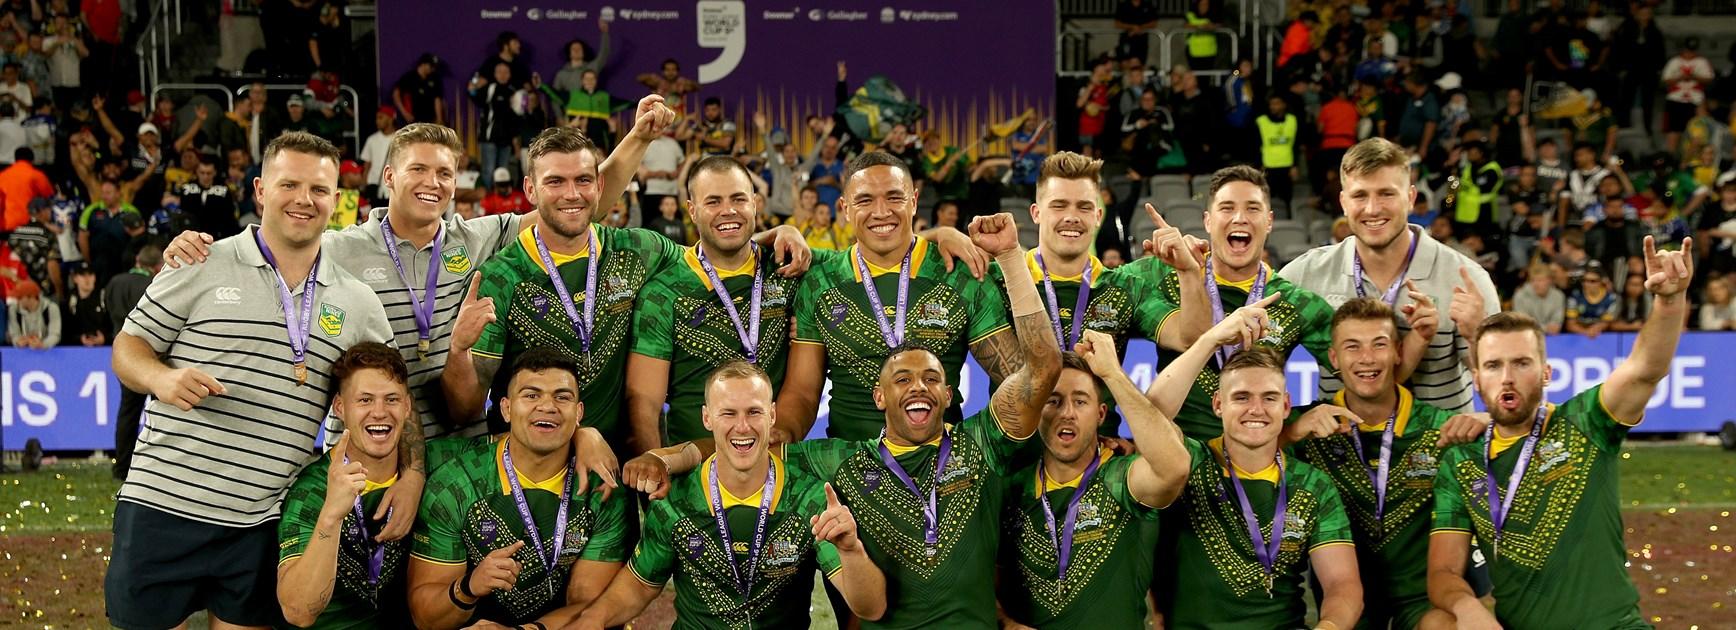 Australia wins Men's title at Downer World Cup Nines